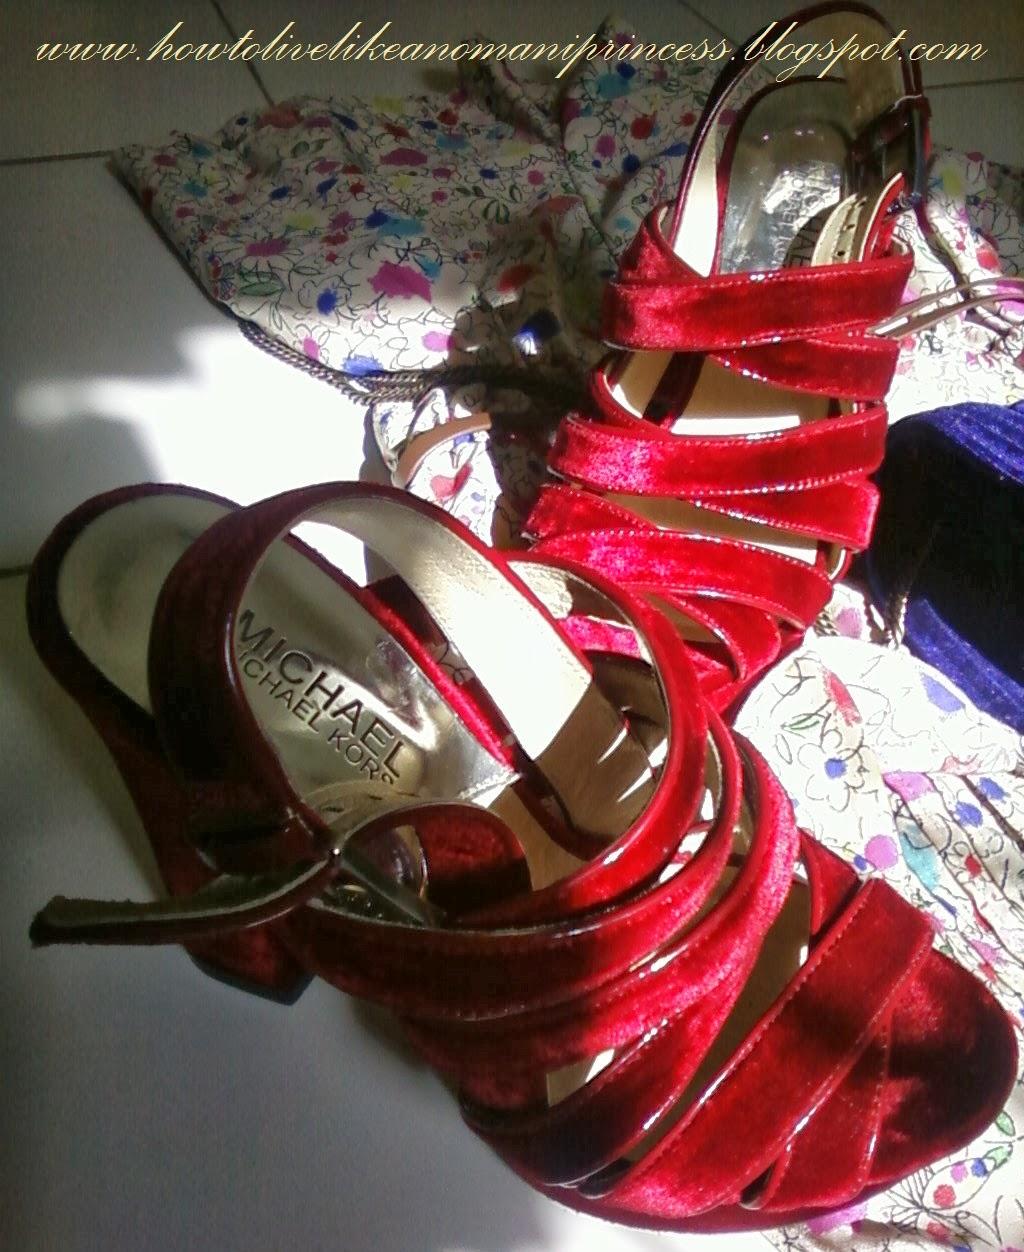 do jimmy choo shoes ever go on sale